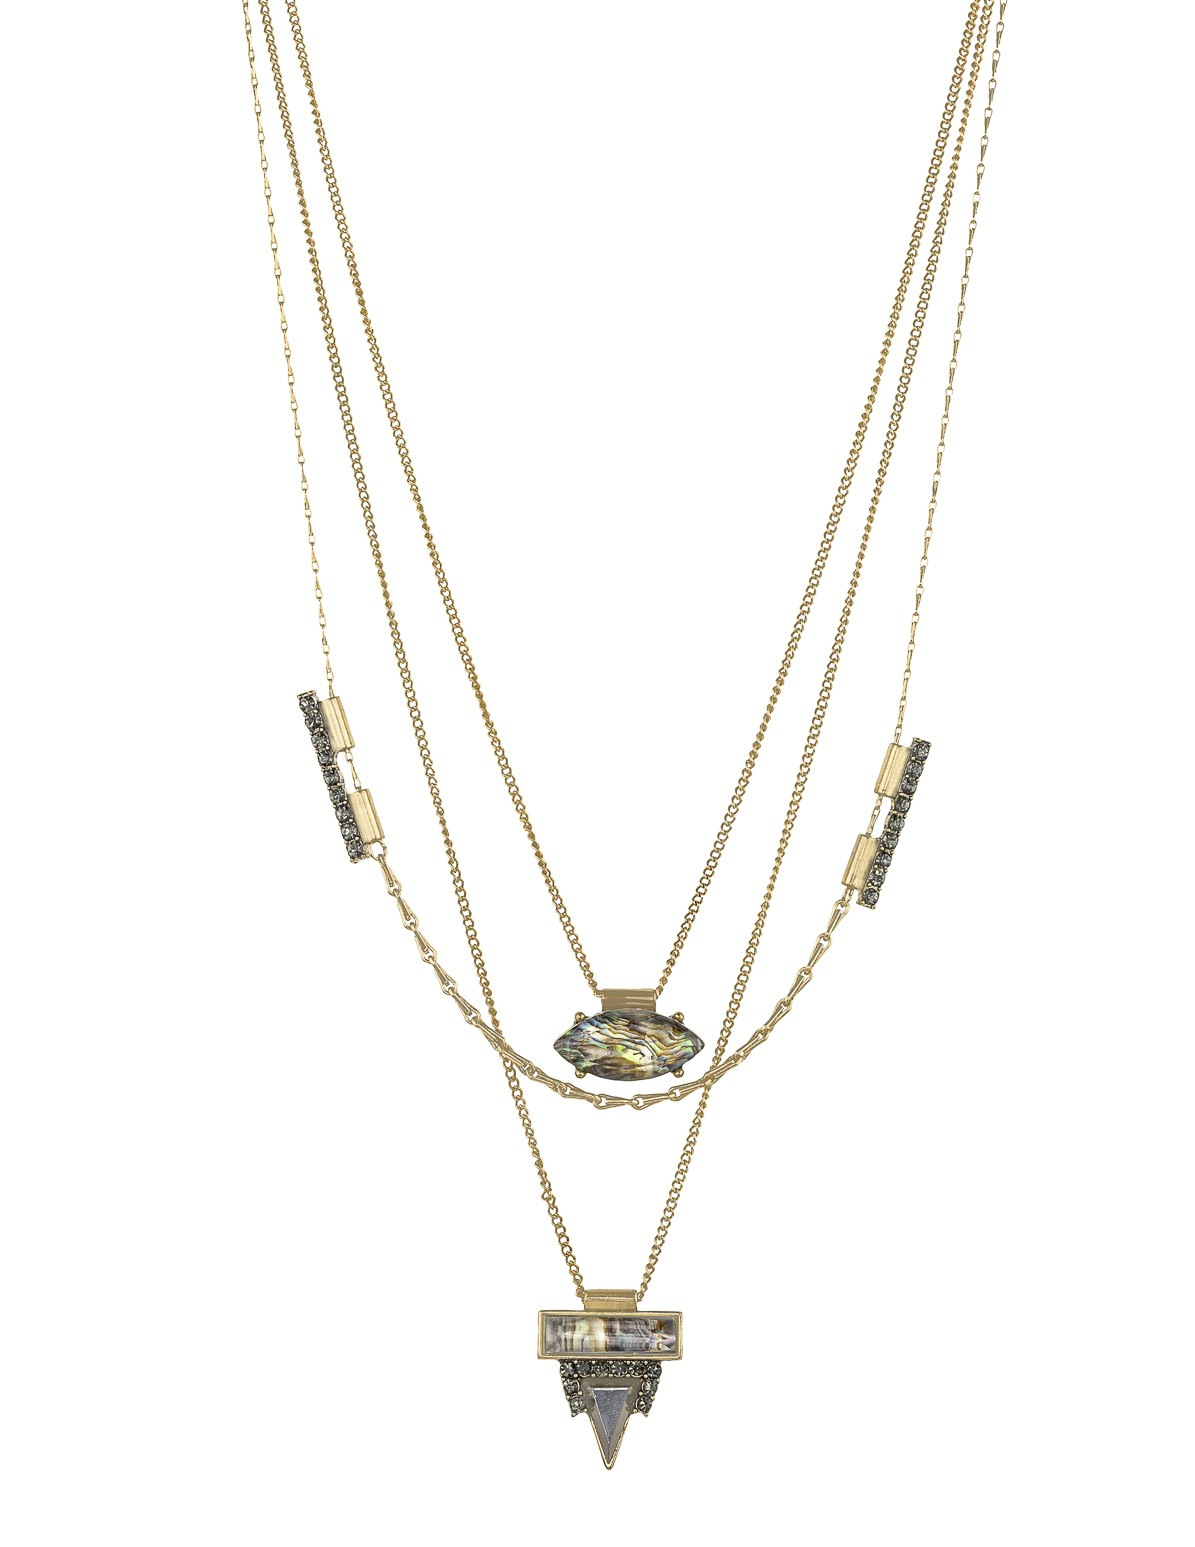 3 Layered Stone and Rhinestone Necklace